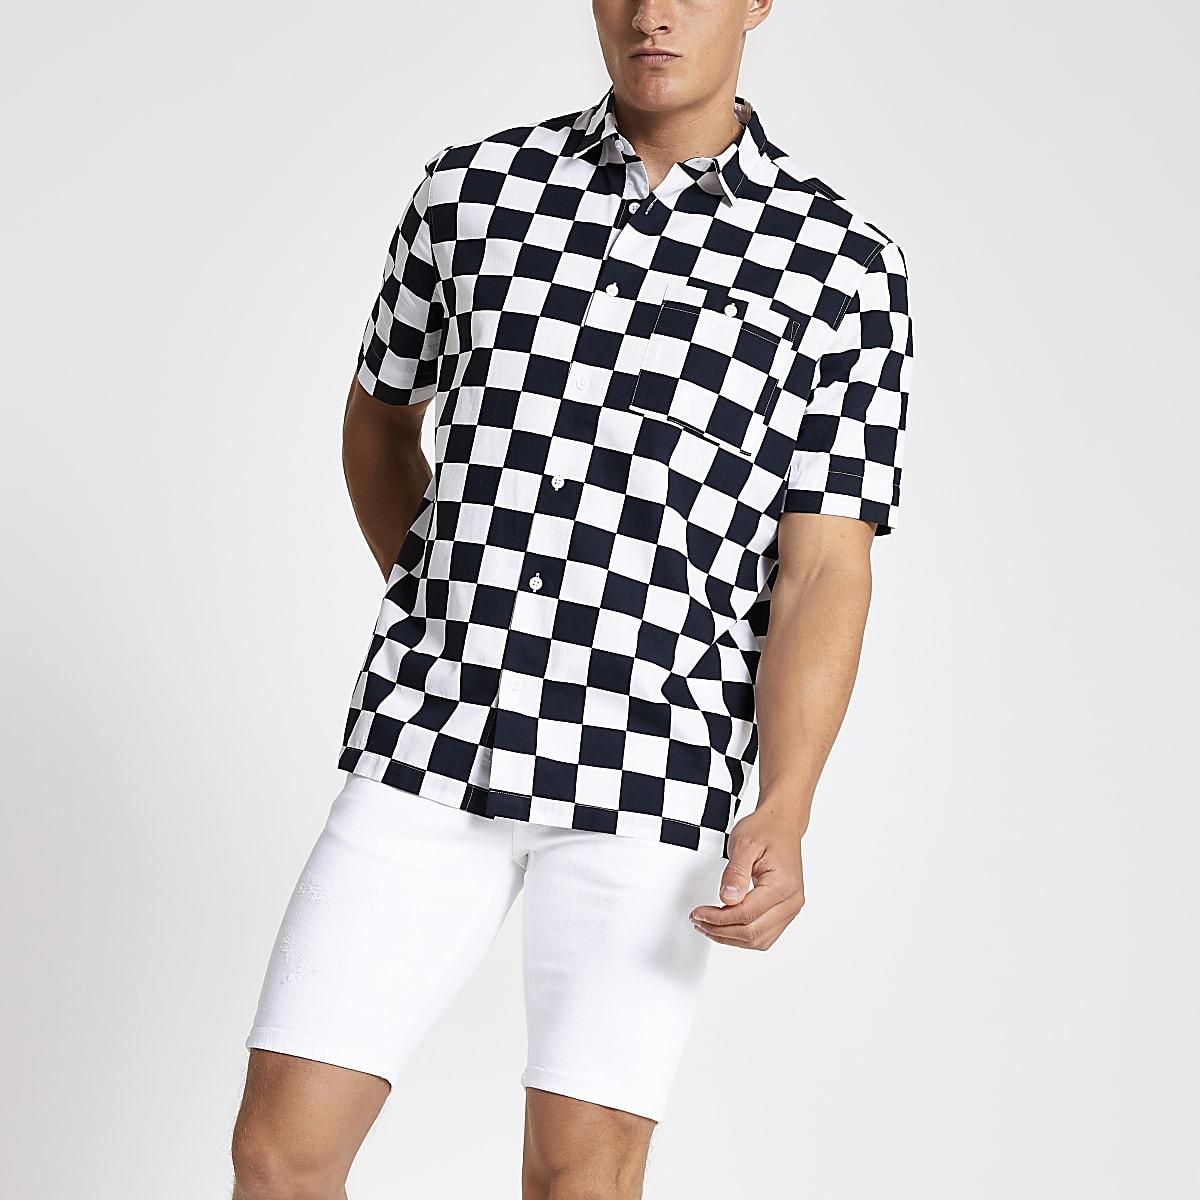 Black checkerboard print short sleeve shirt